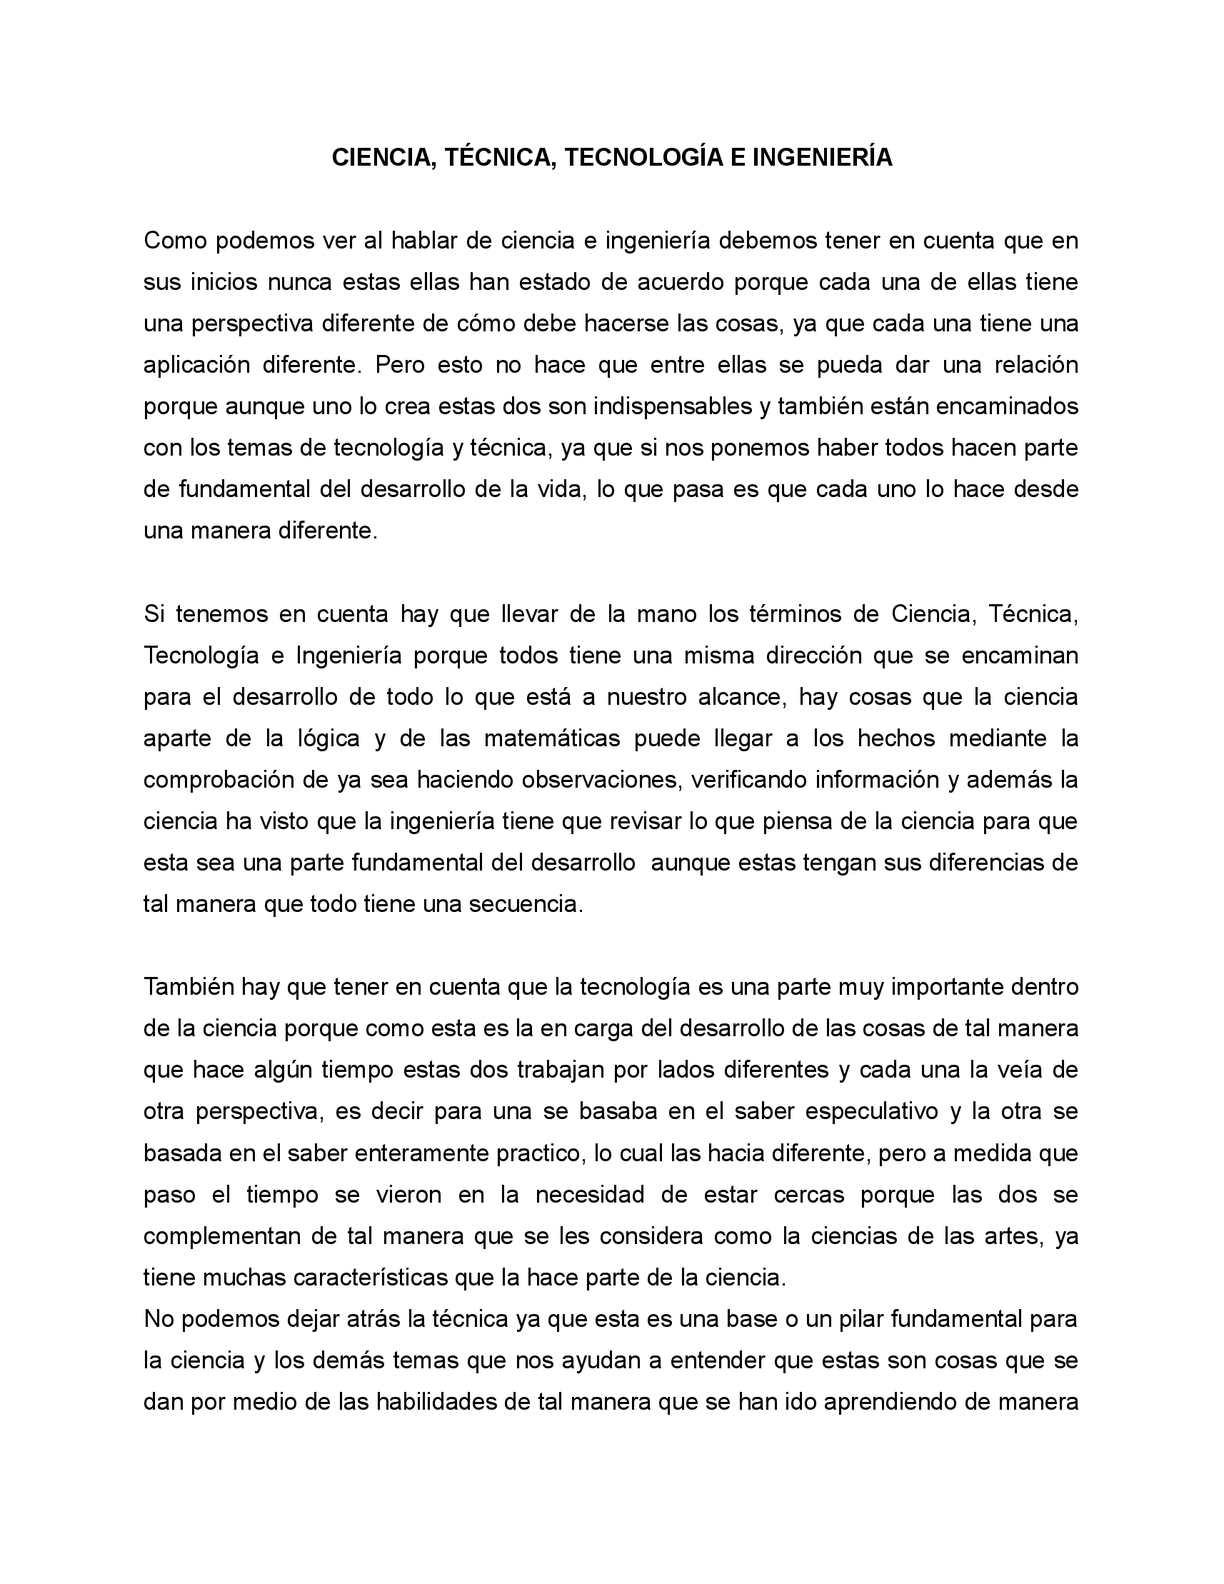 Calaméo - LA RELACIÓN ENTRE CIENCIA E INGENIERIA